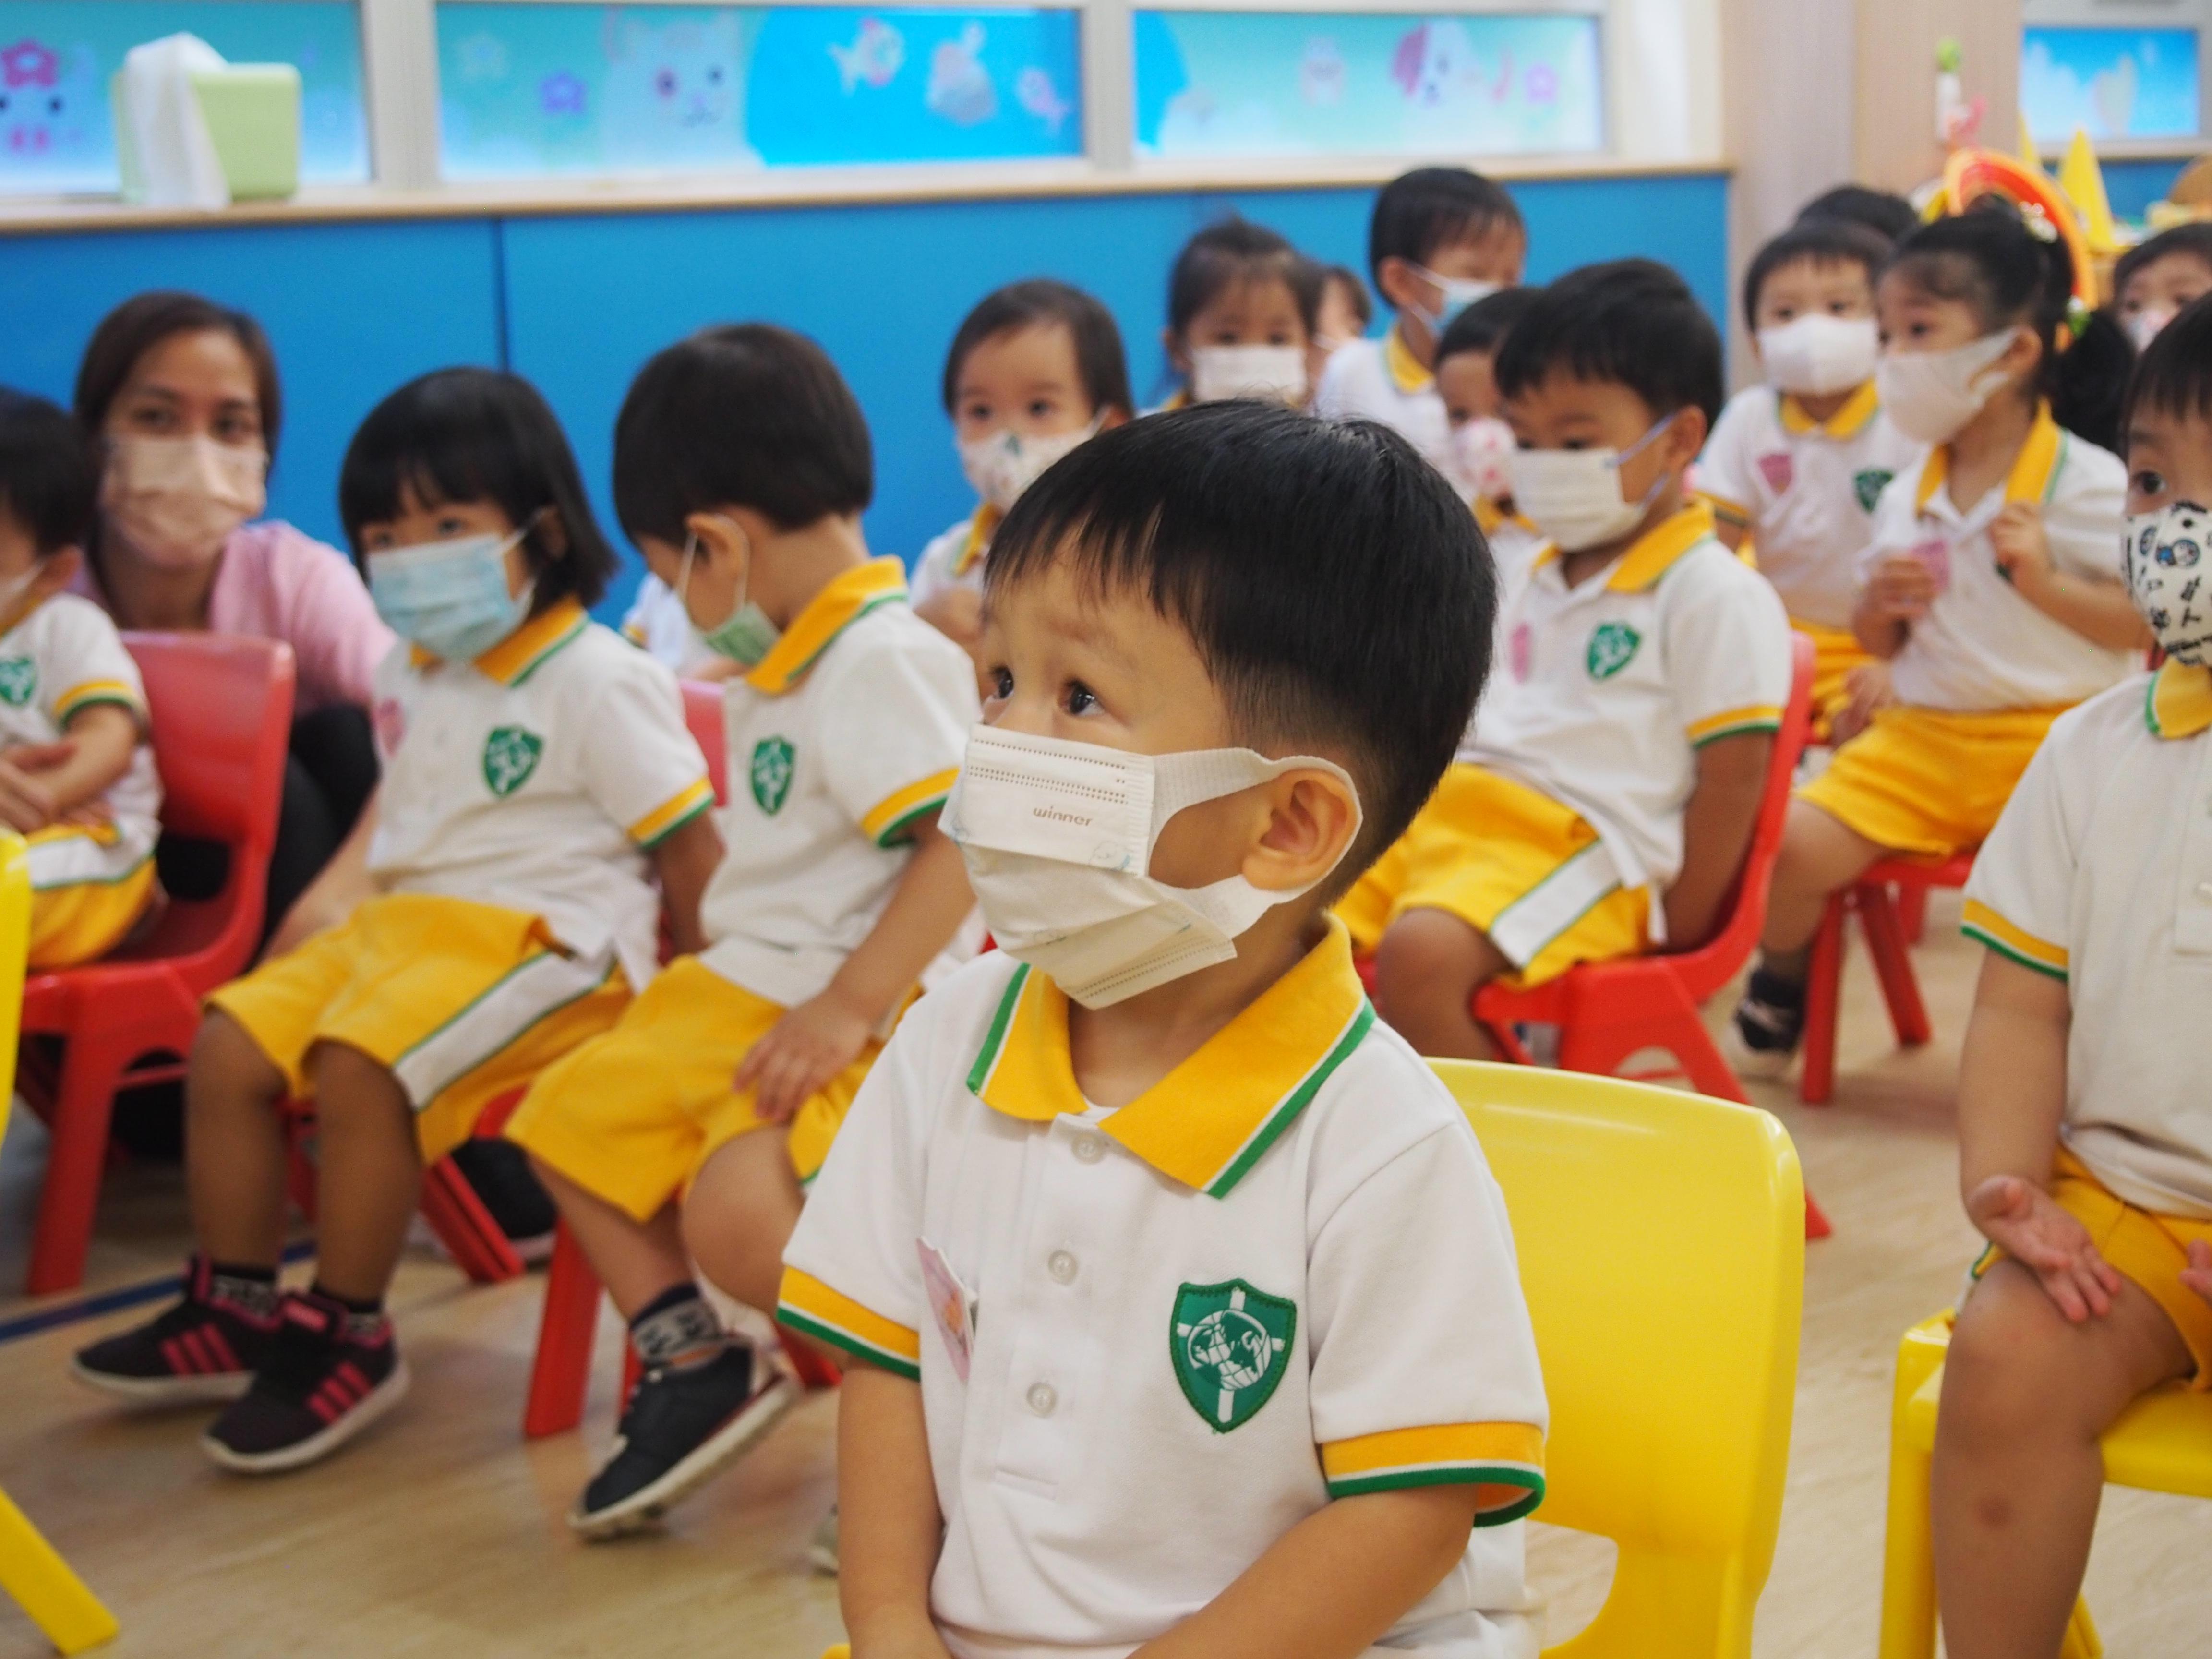 http://npmc.edu.hk/sites/default/files/p9240364.jpg